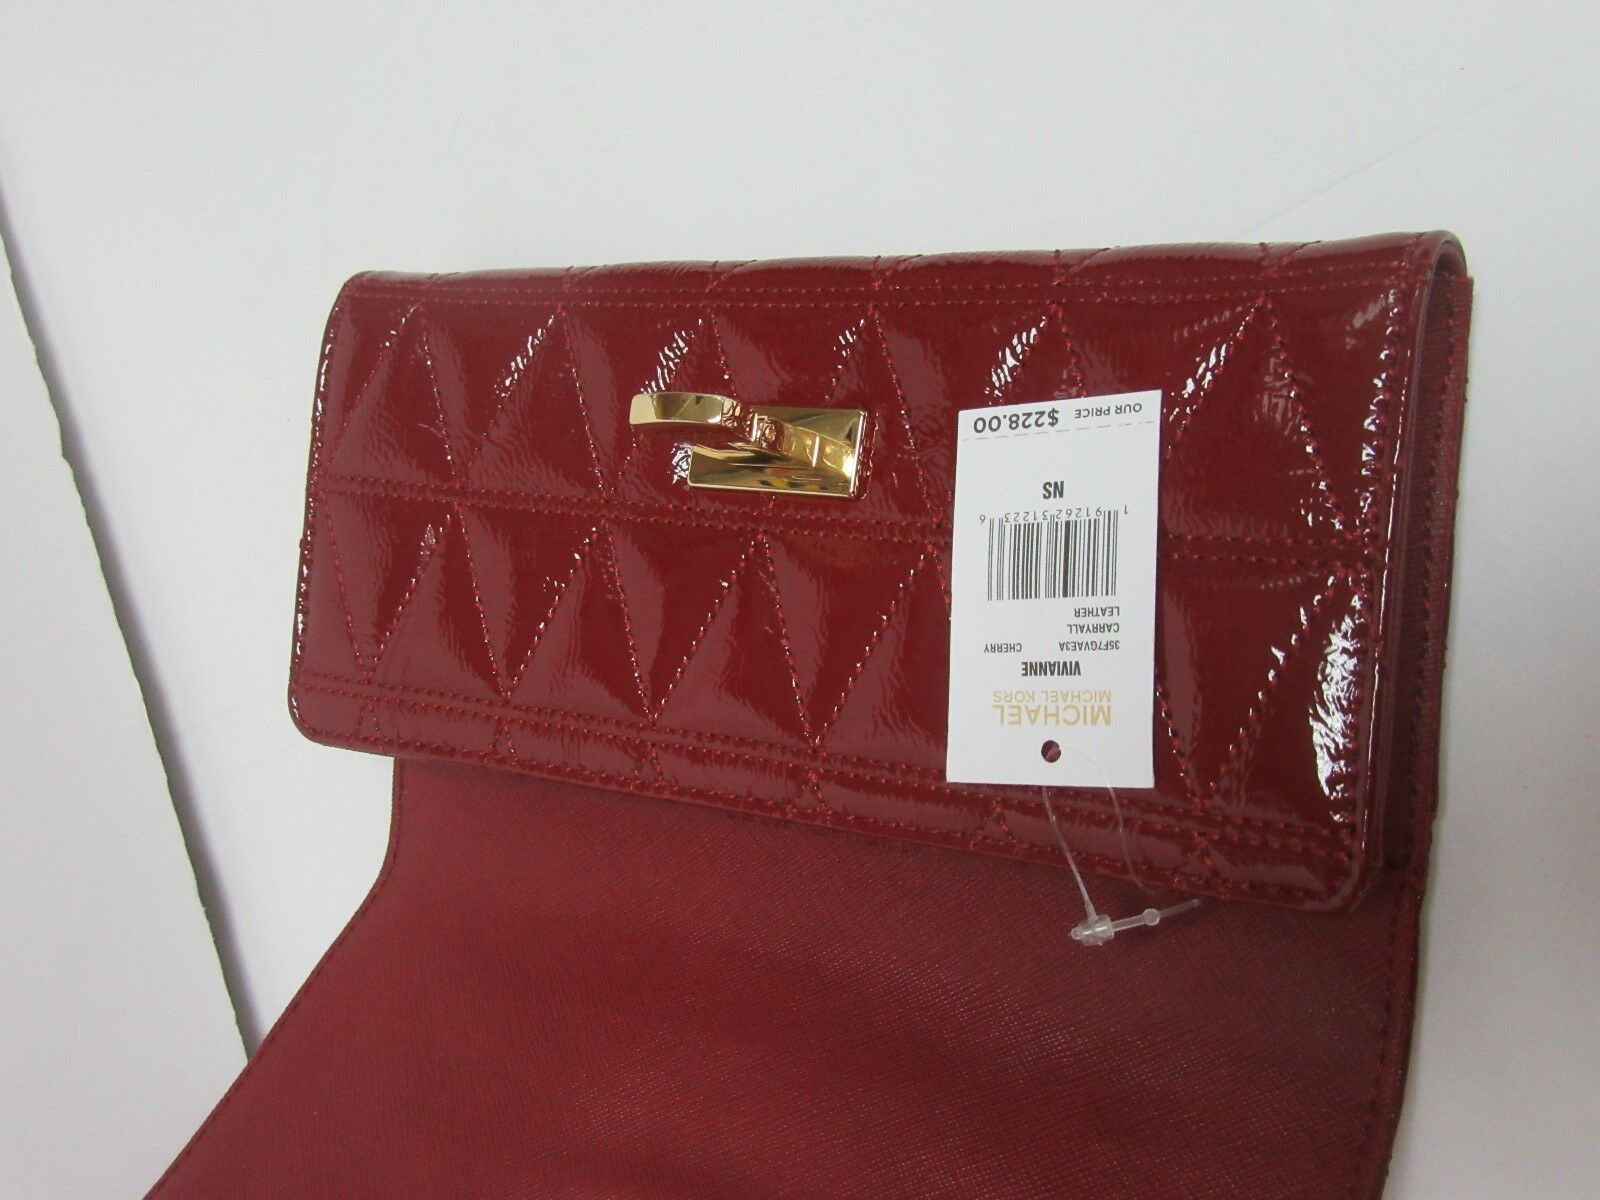 87604985c476 Michael Kors Vivianne Cherry Patent Leather Carryall Wallet 35f7gvae3a for  sale online